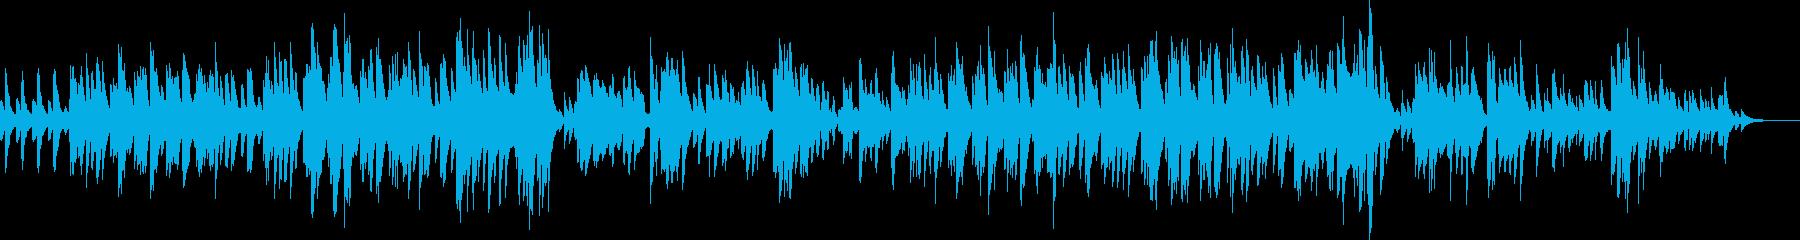 s006 幻想的な森ステージの再生済みの波形